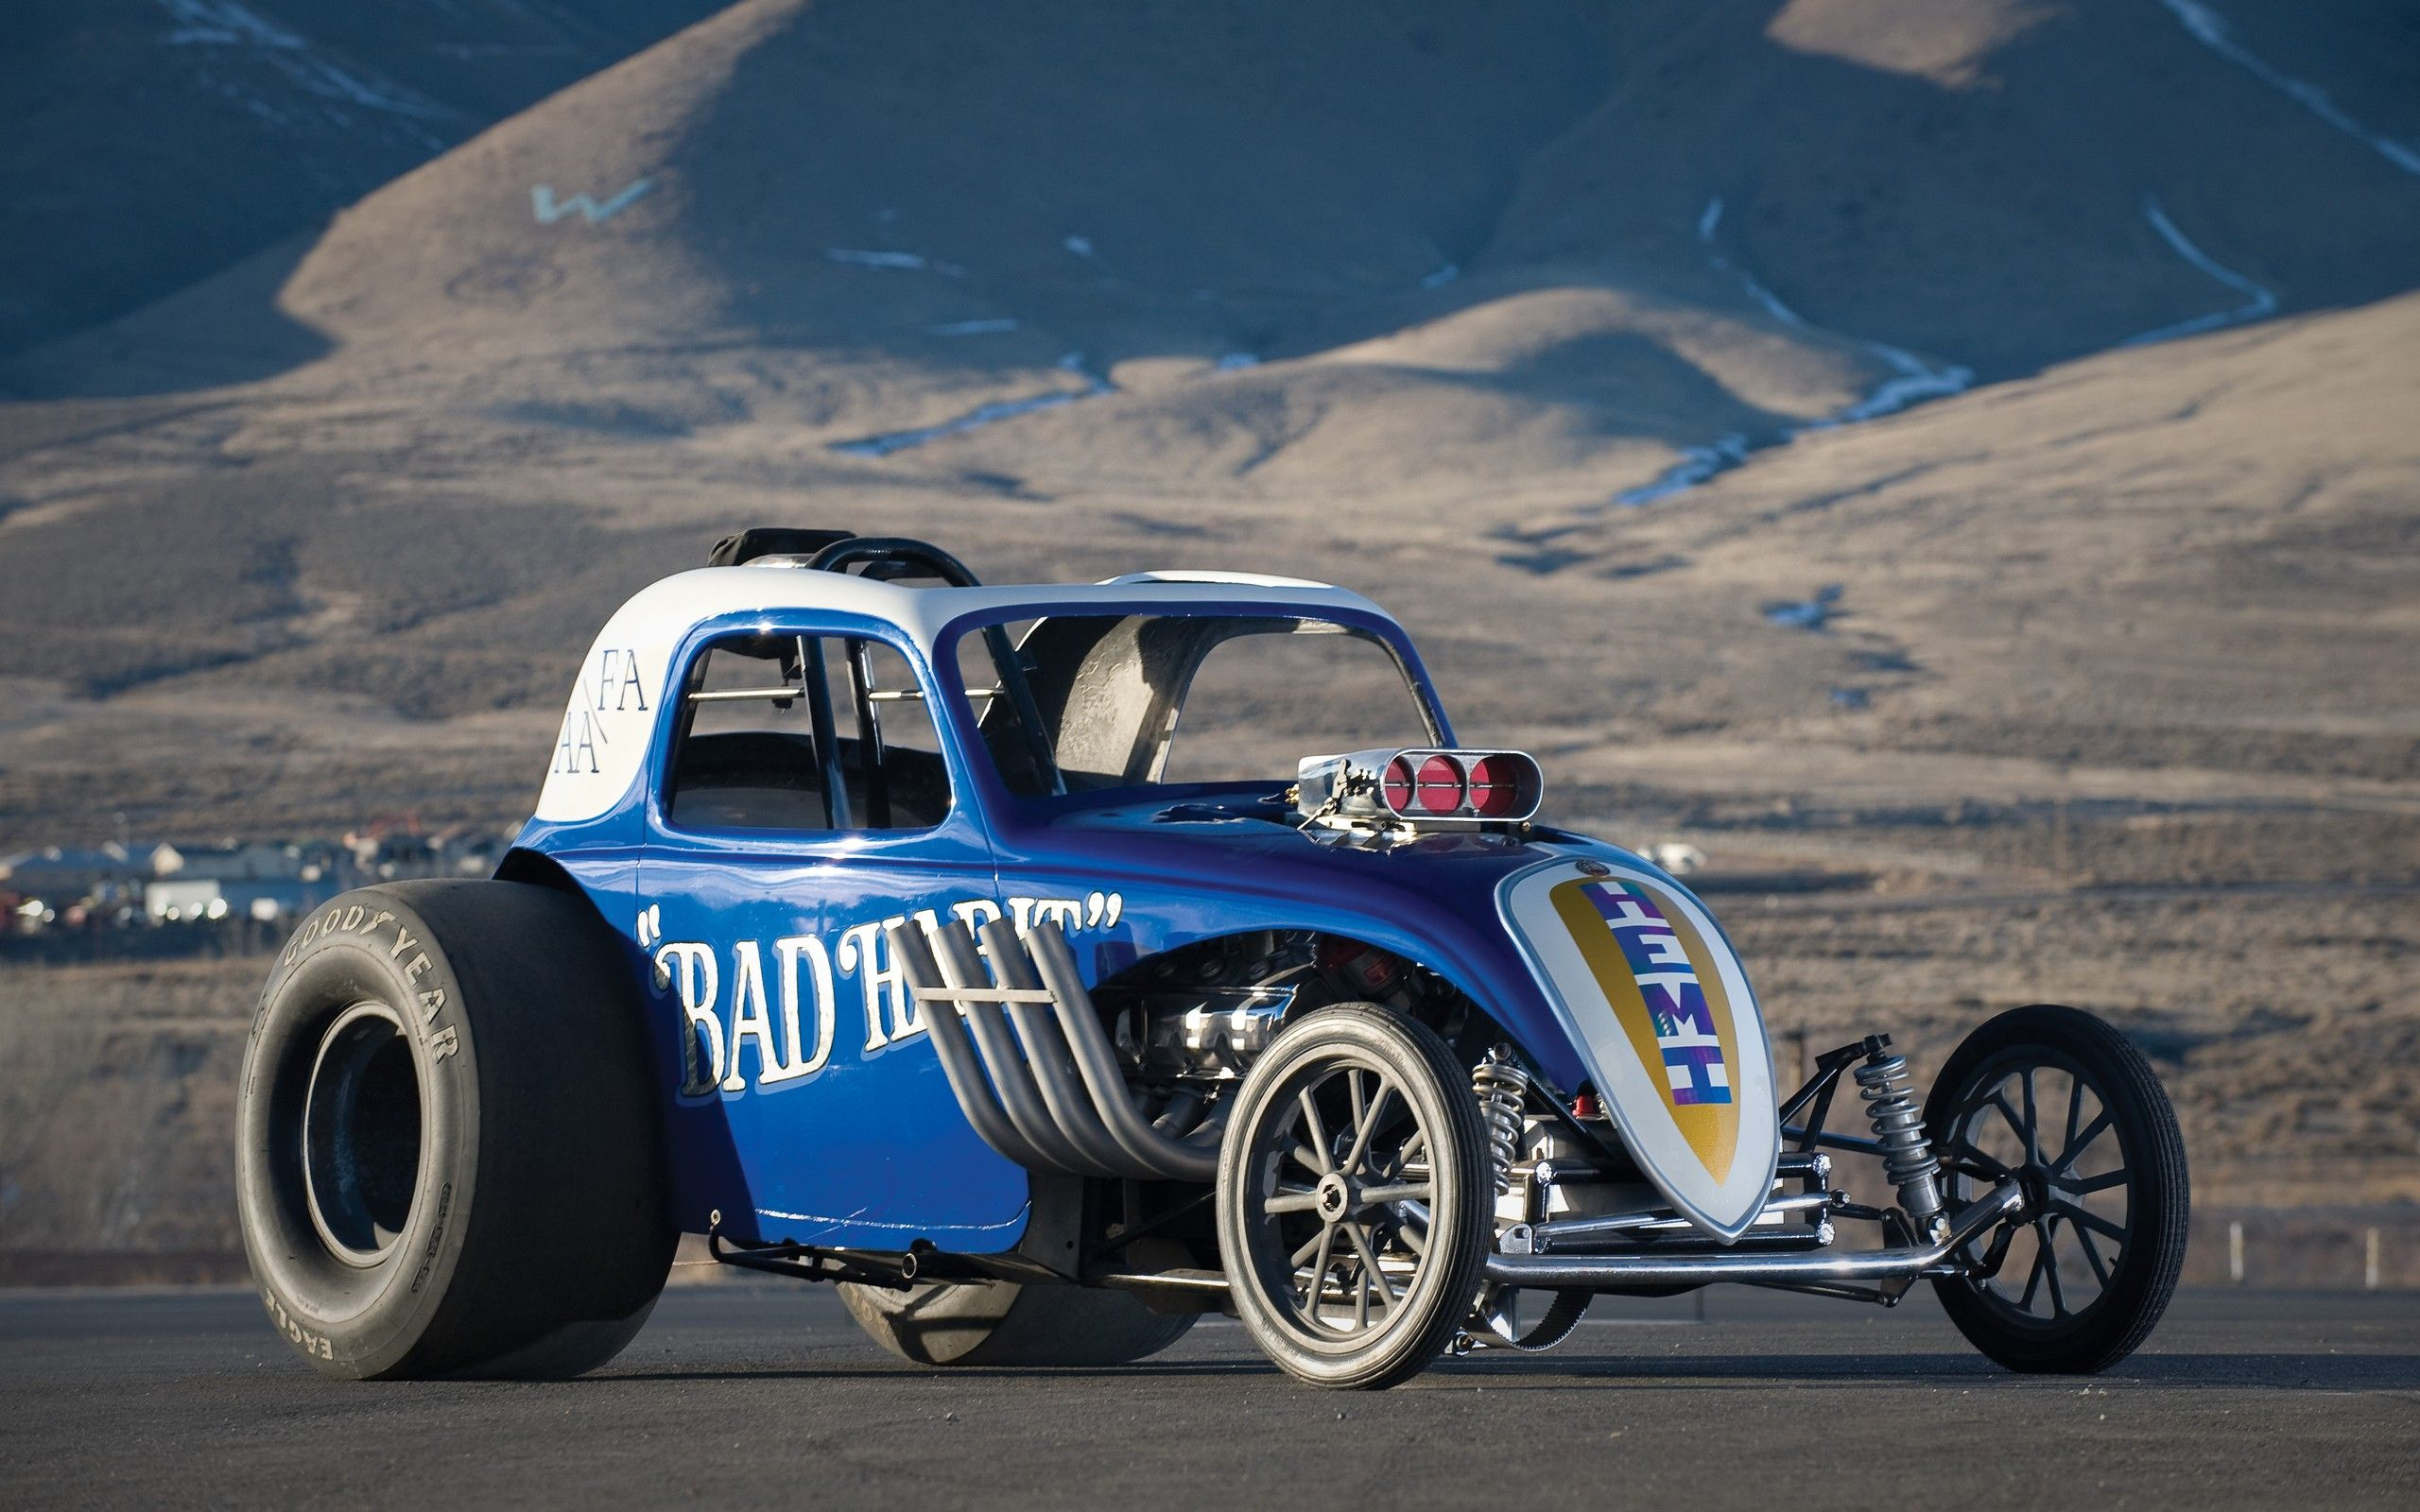 Cars Hot Rod Vehicles Supercars Tuning Wheels Racing Sport Cars ...